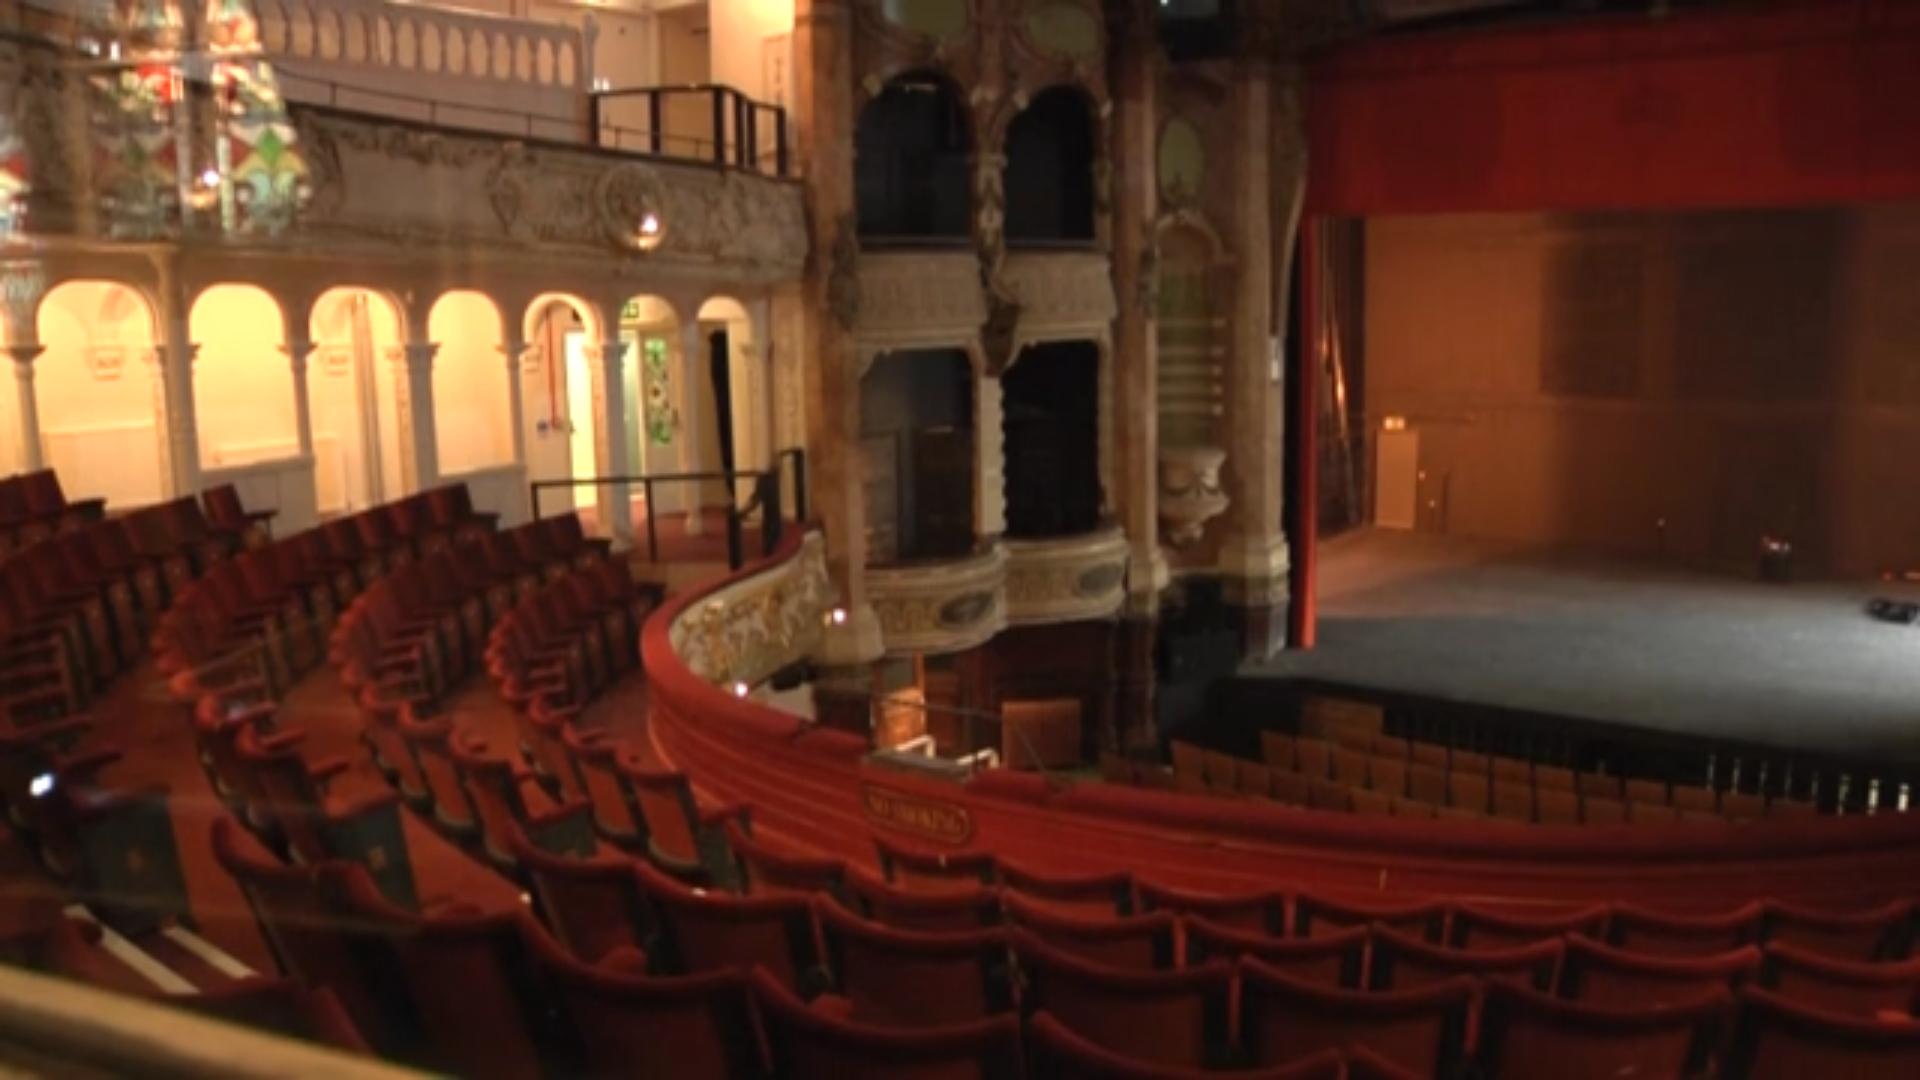 A new Theatre Royal